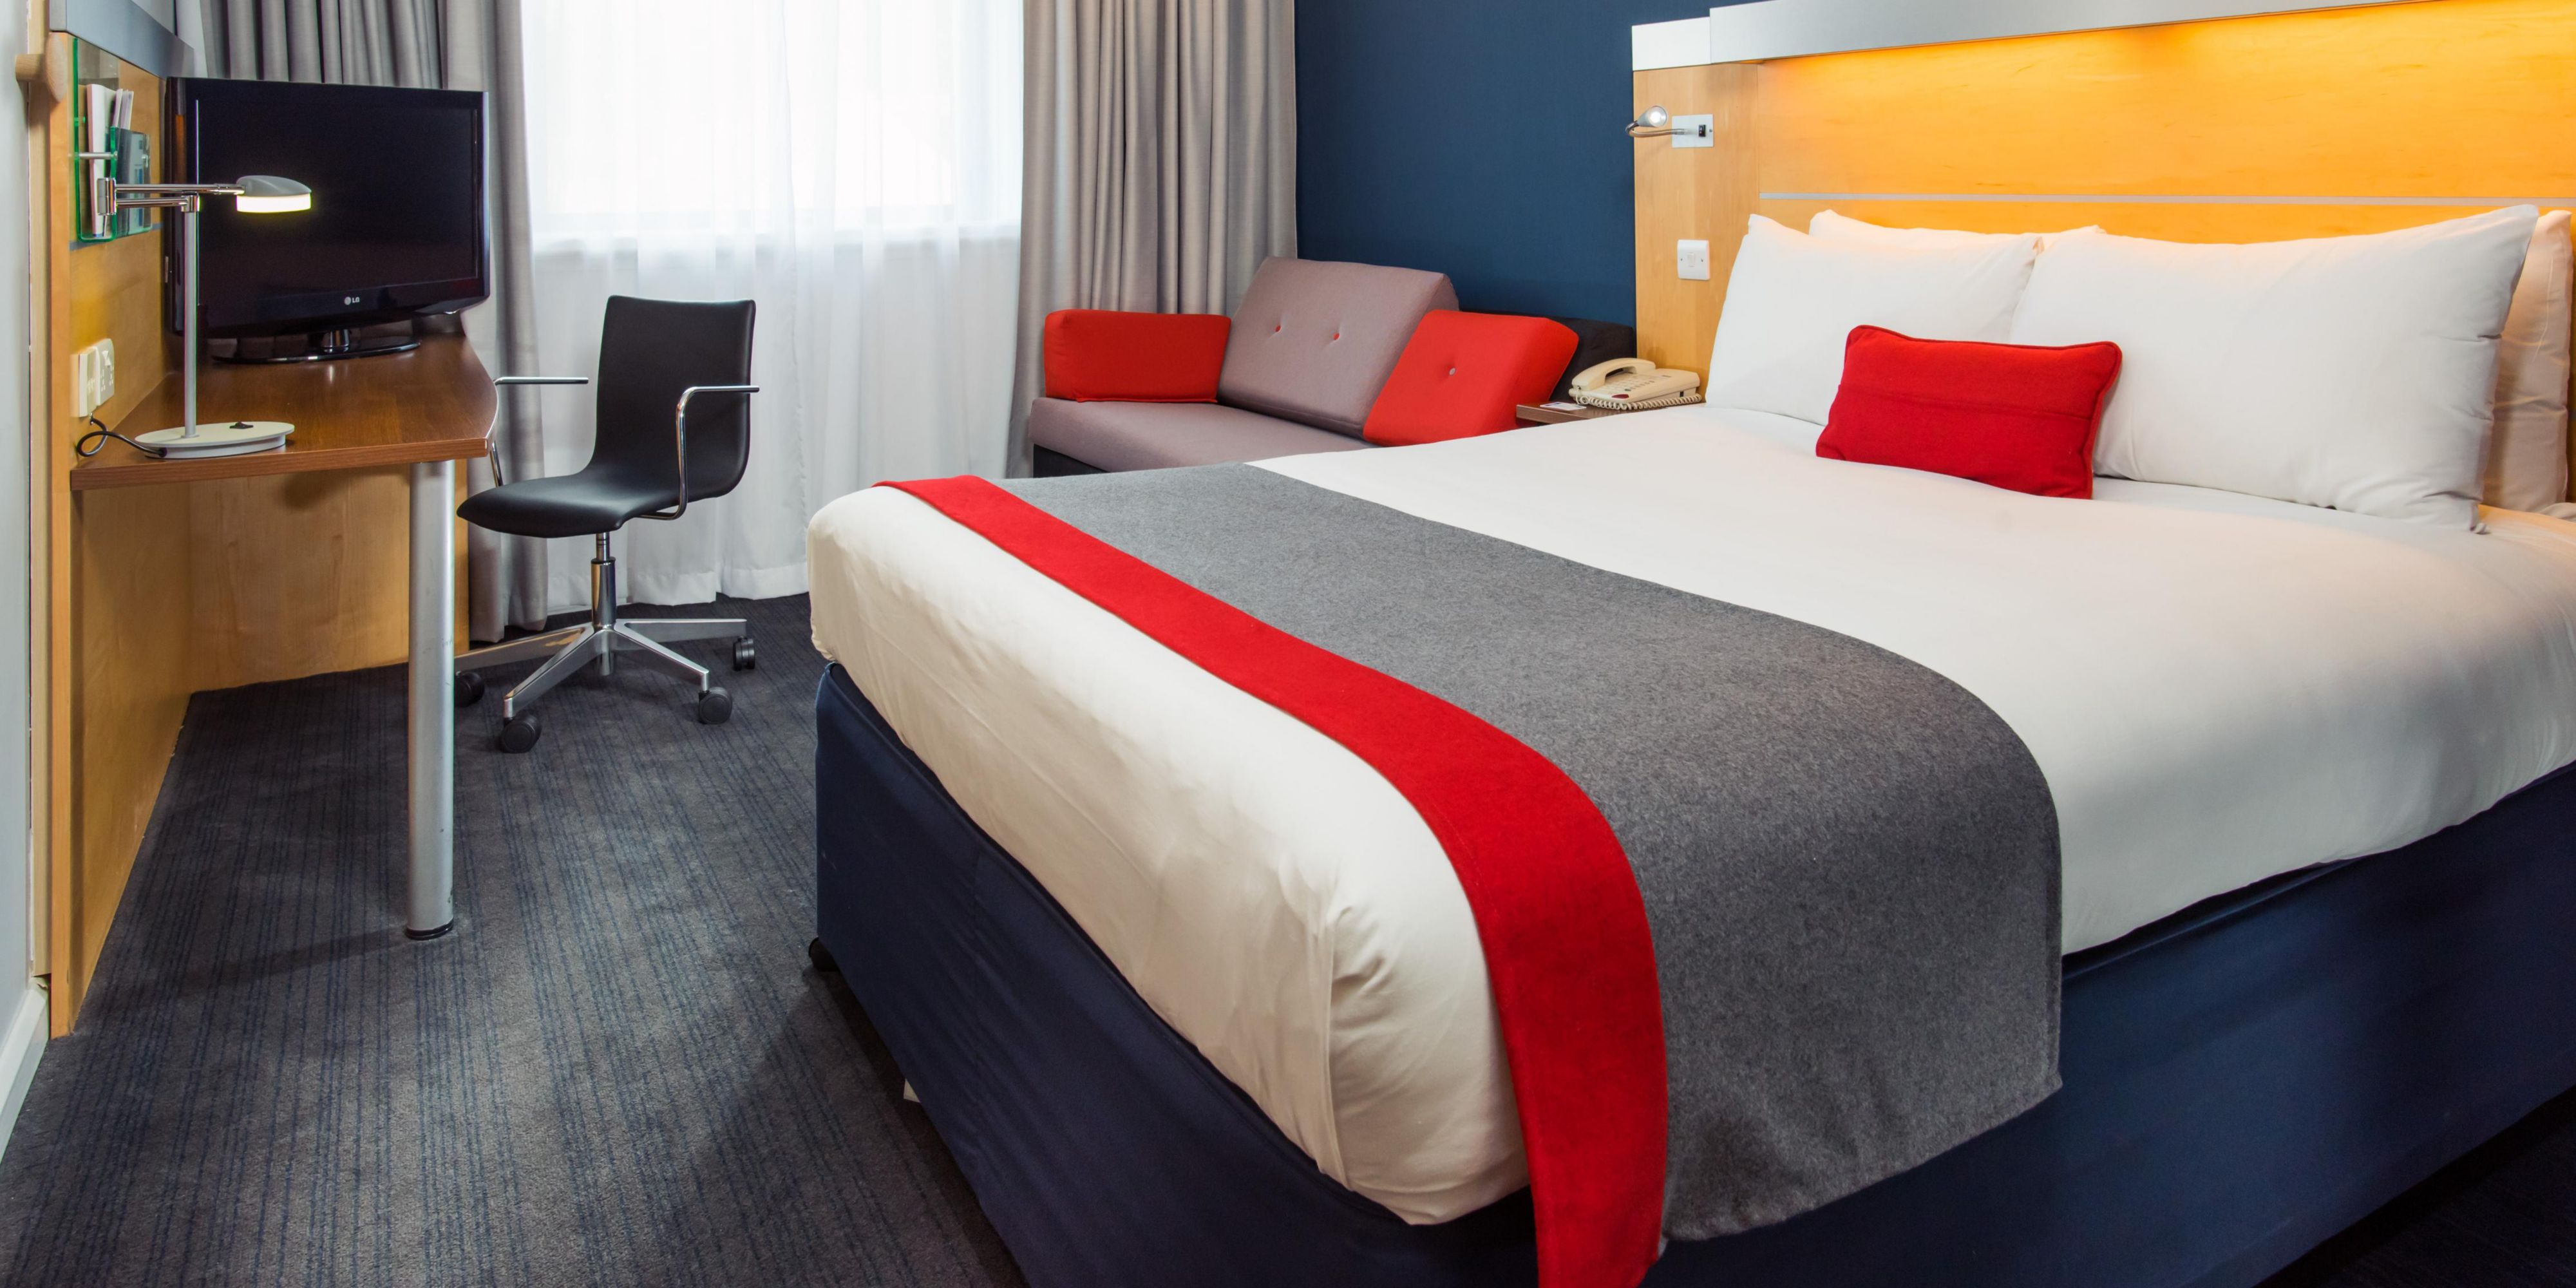 Holiday Inn Express Hemel Hempstead Hotel by IHG